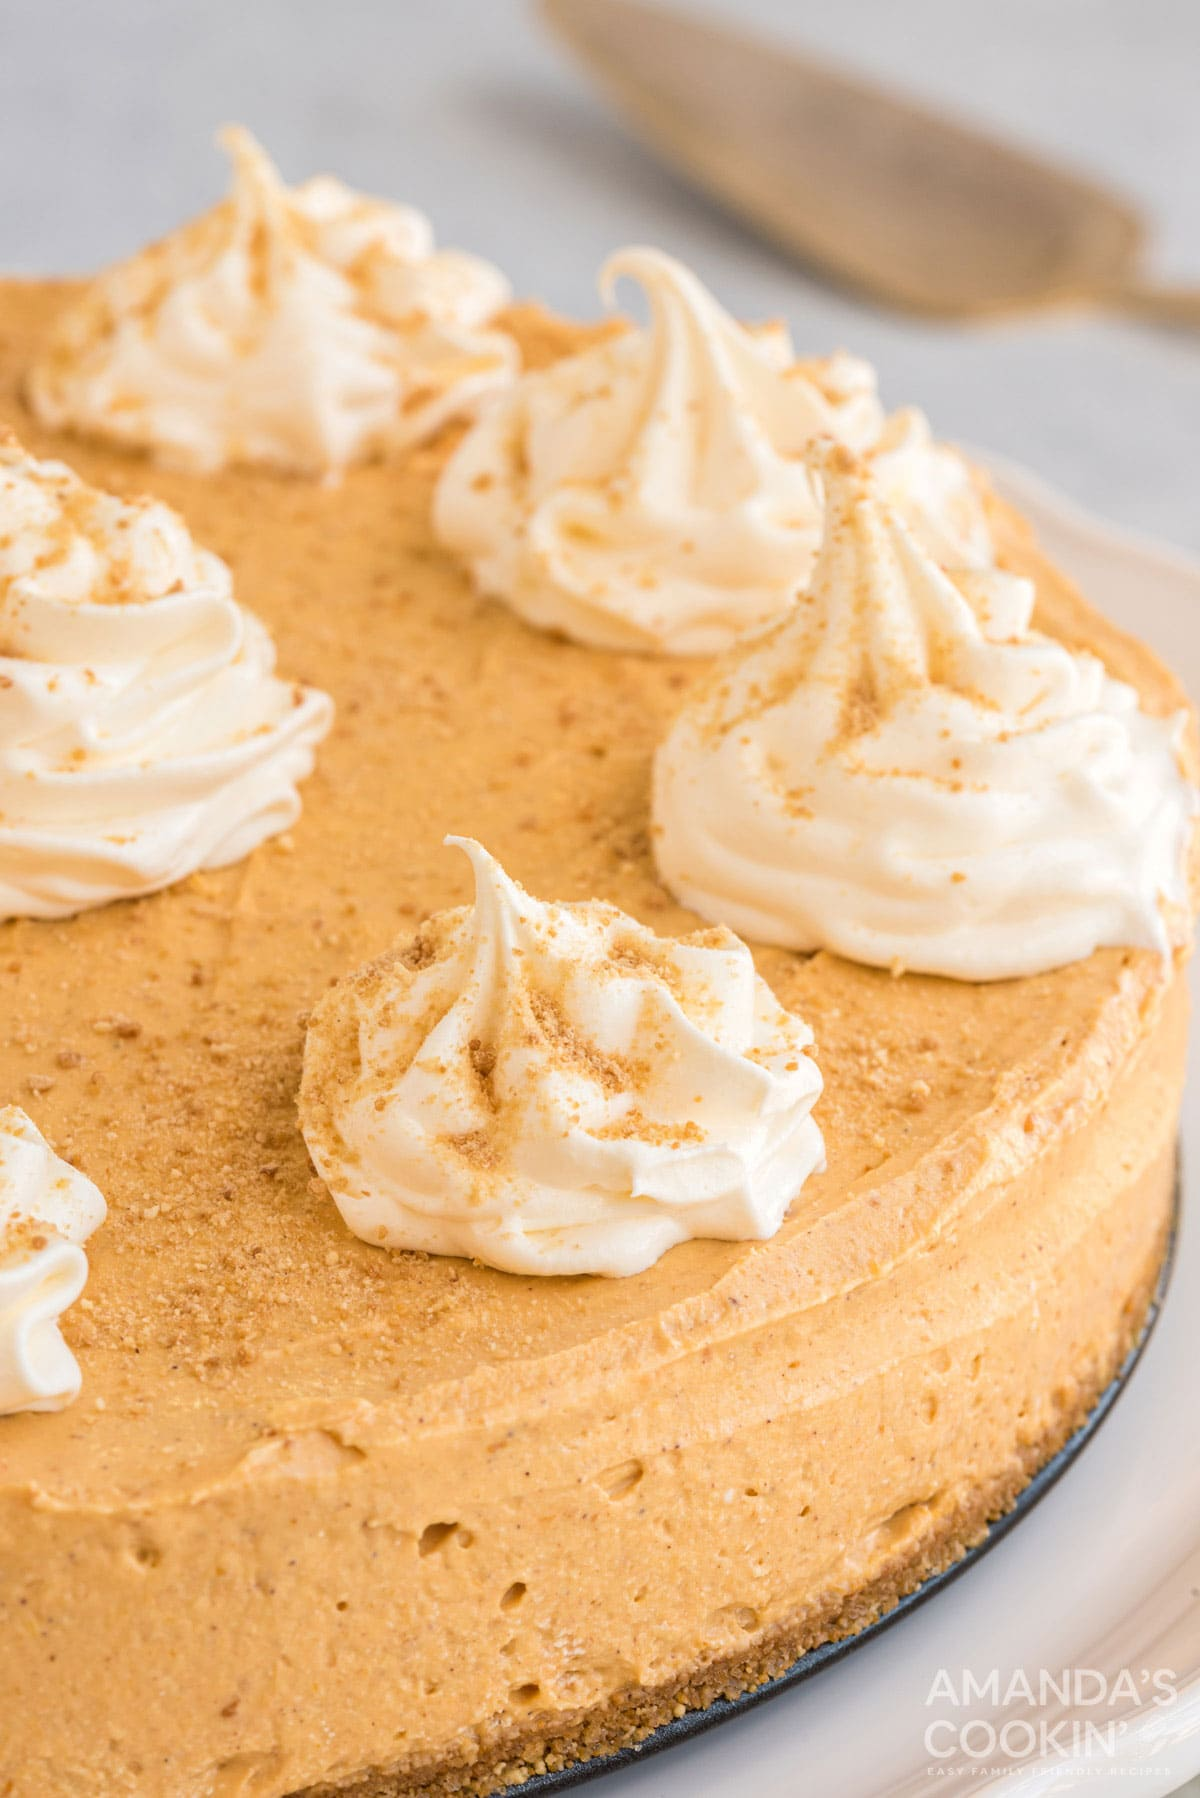 no bake pumpkin cheesecake with whipped topping garnish